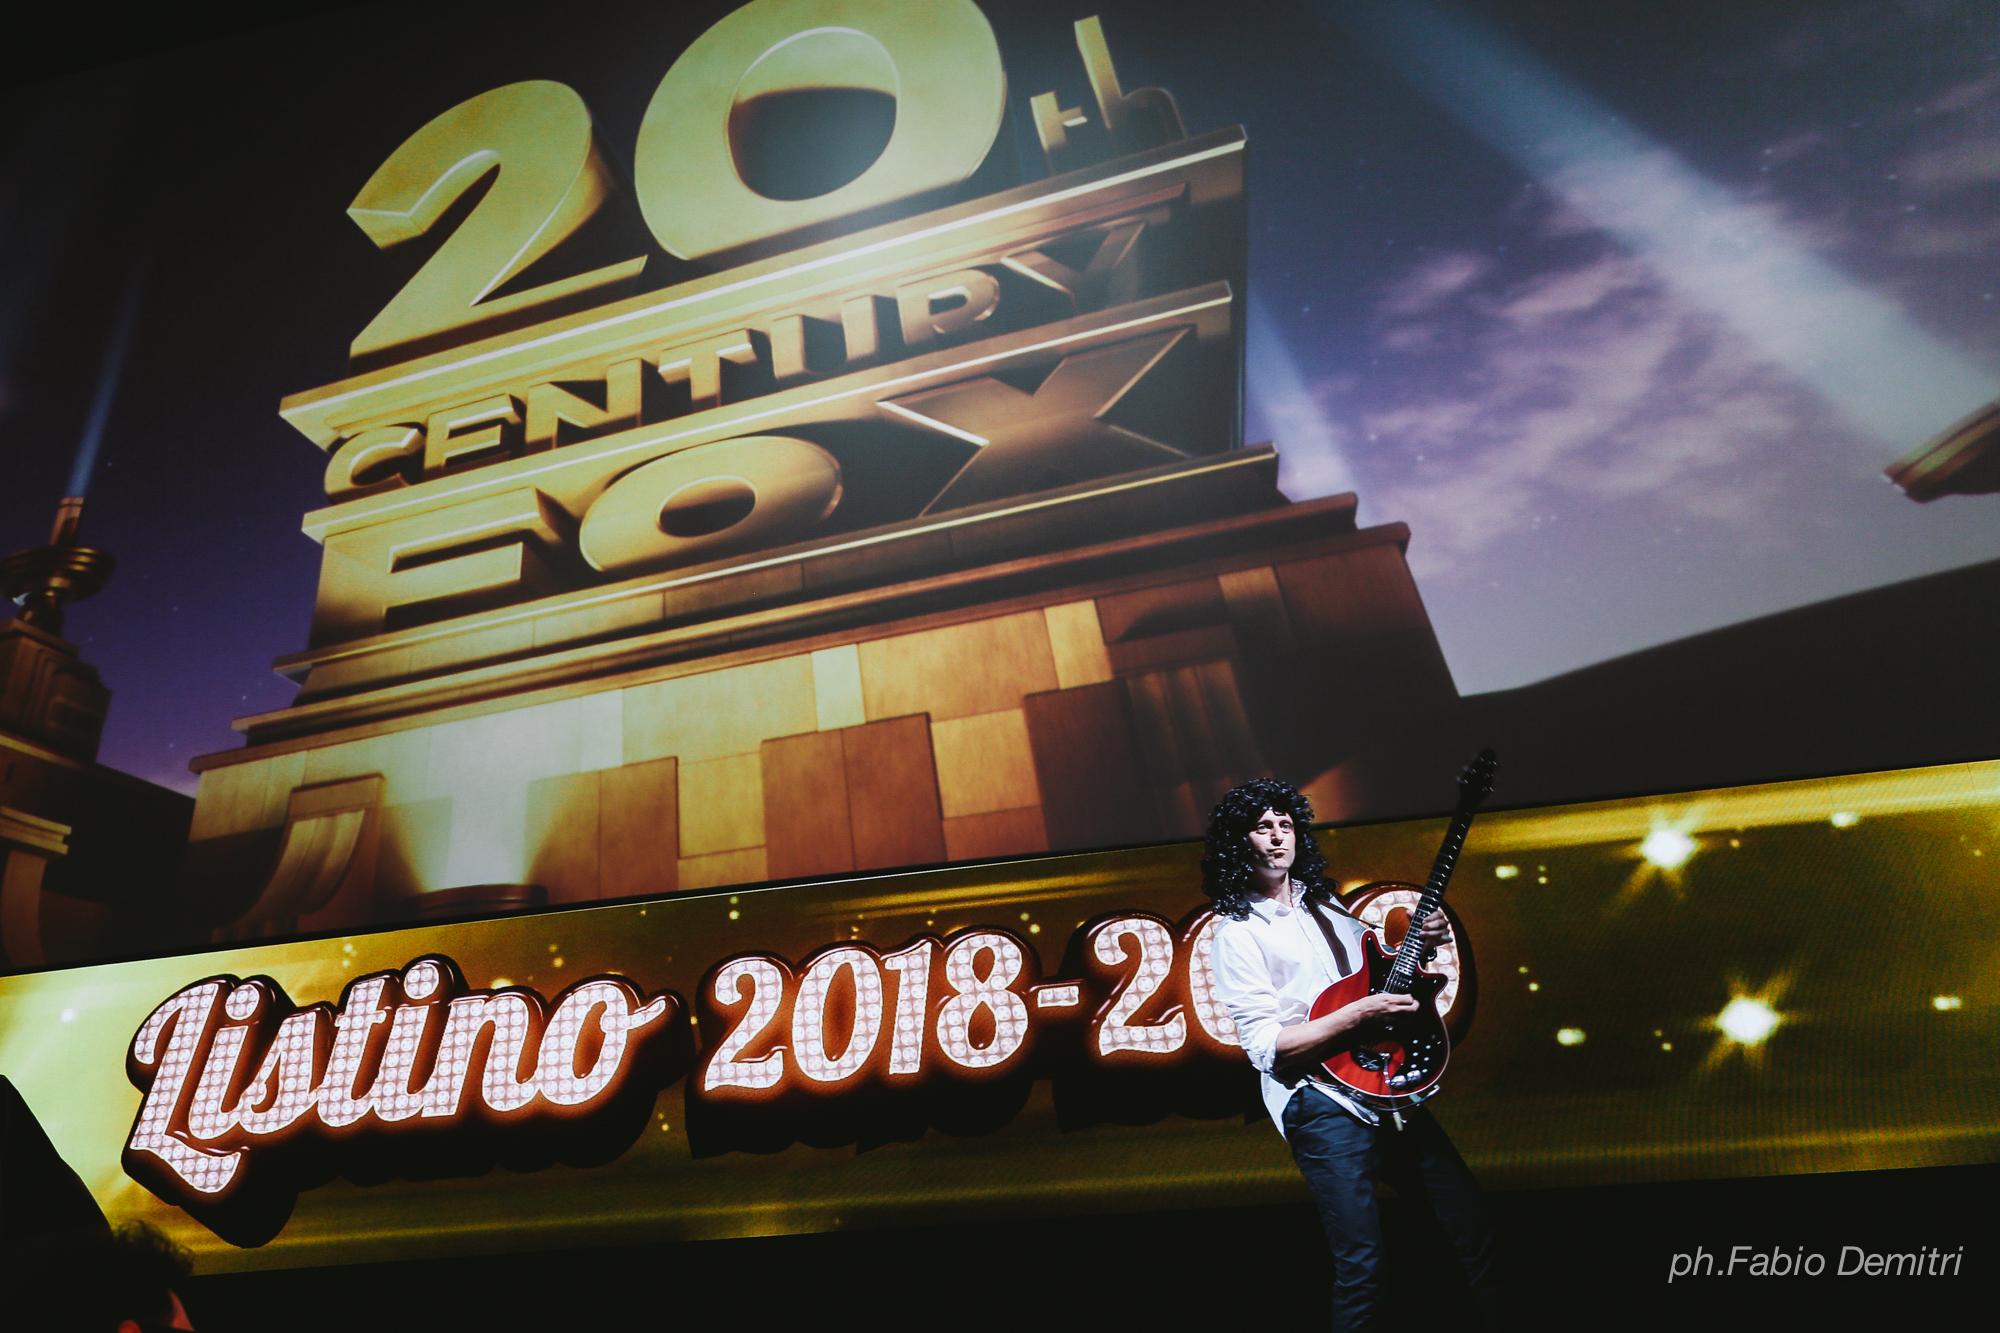 20th century fox - bohemian rhapsody - Ciné 2018